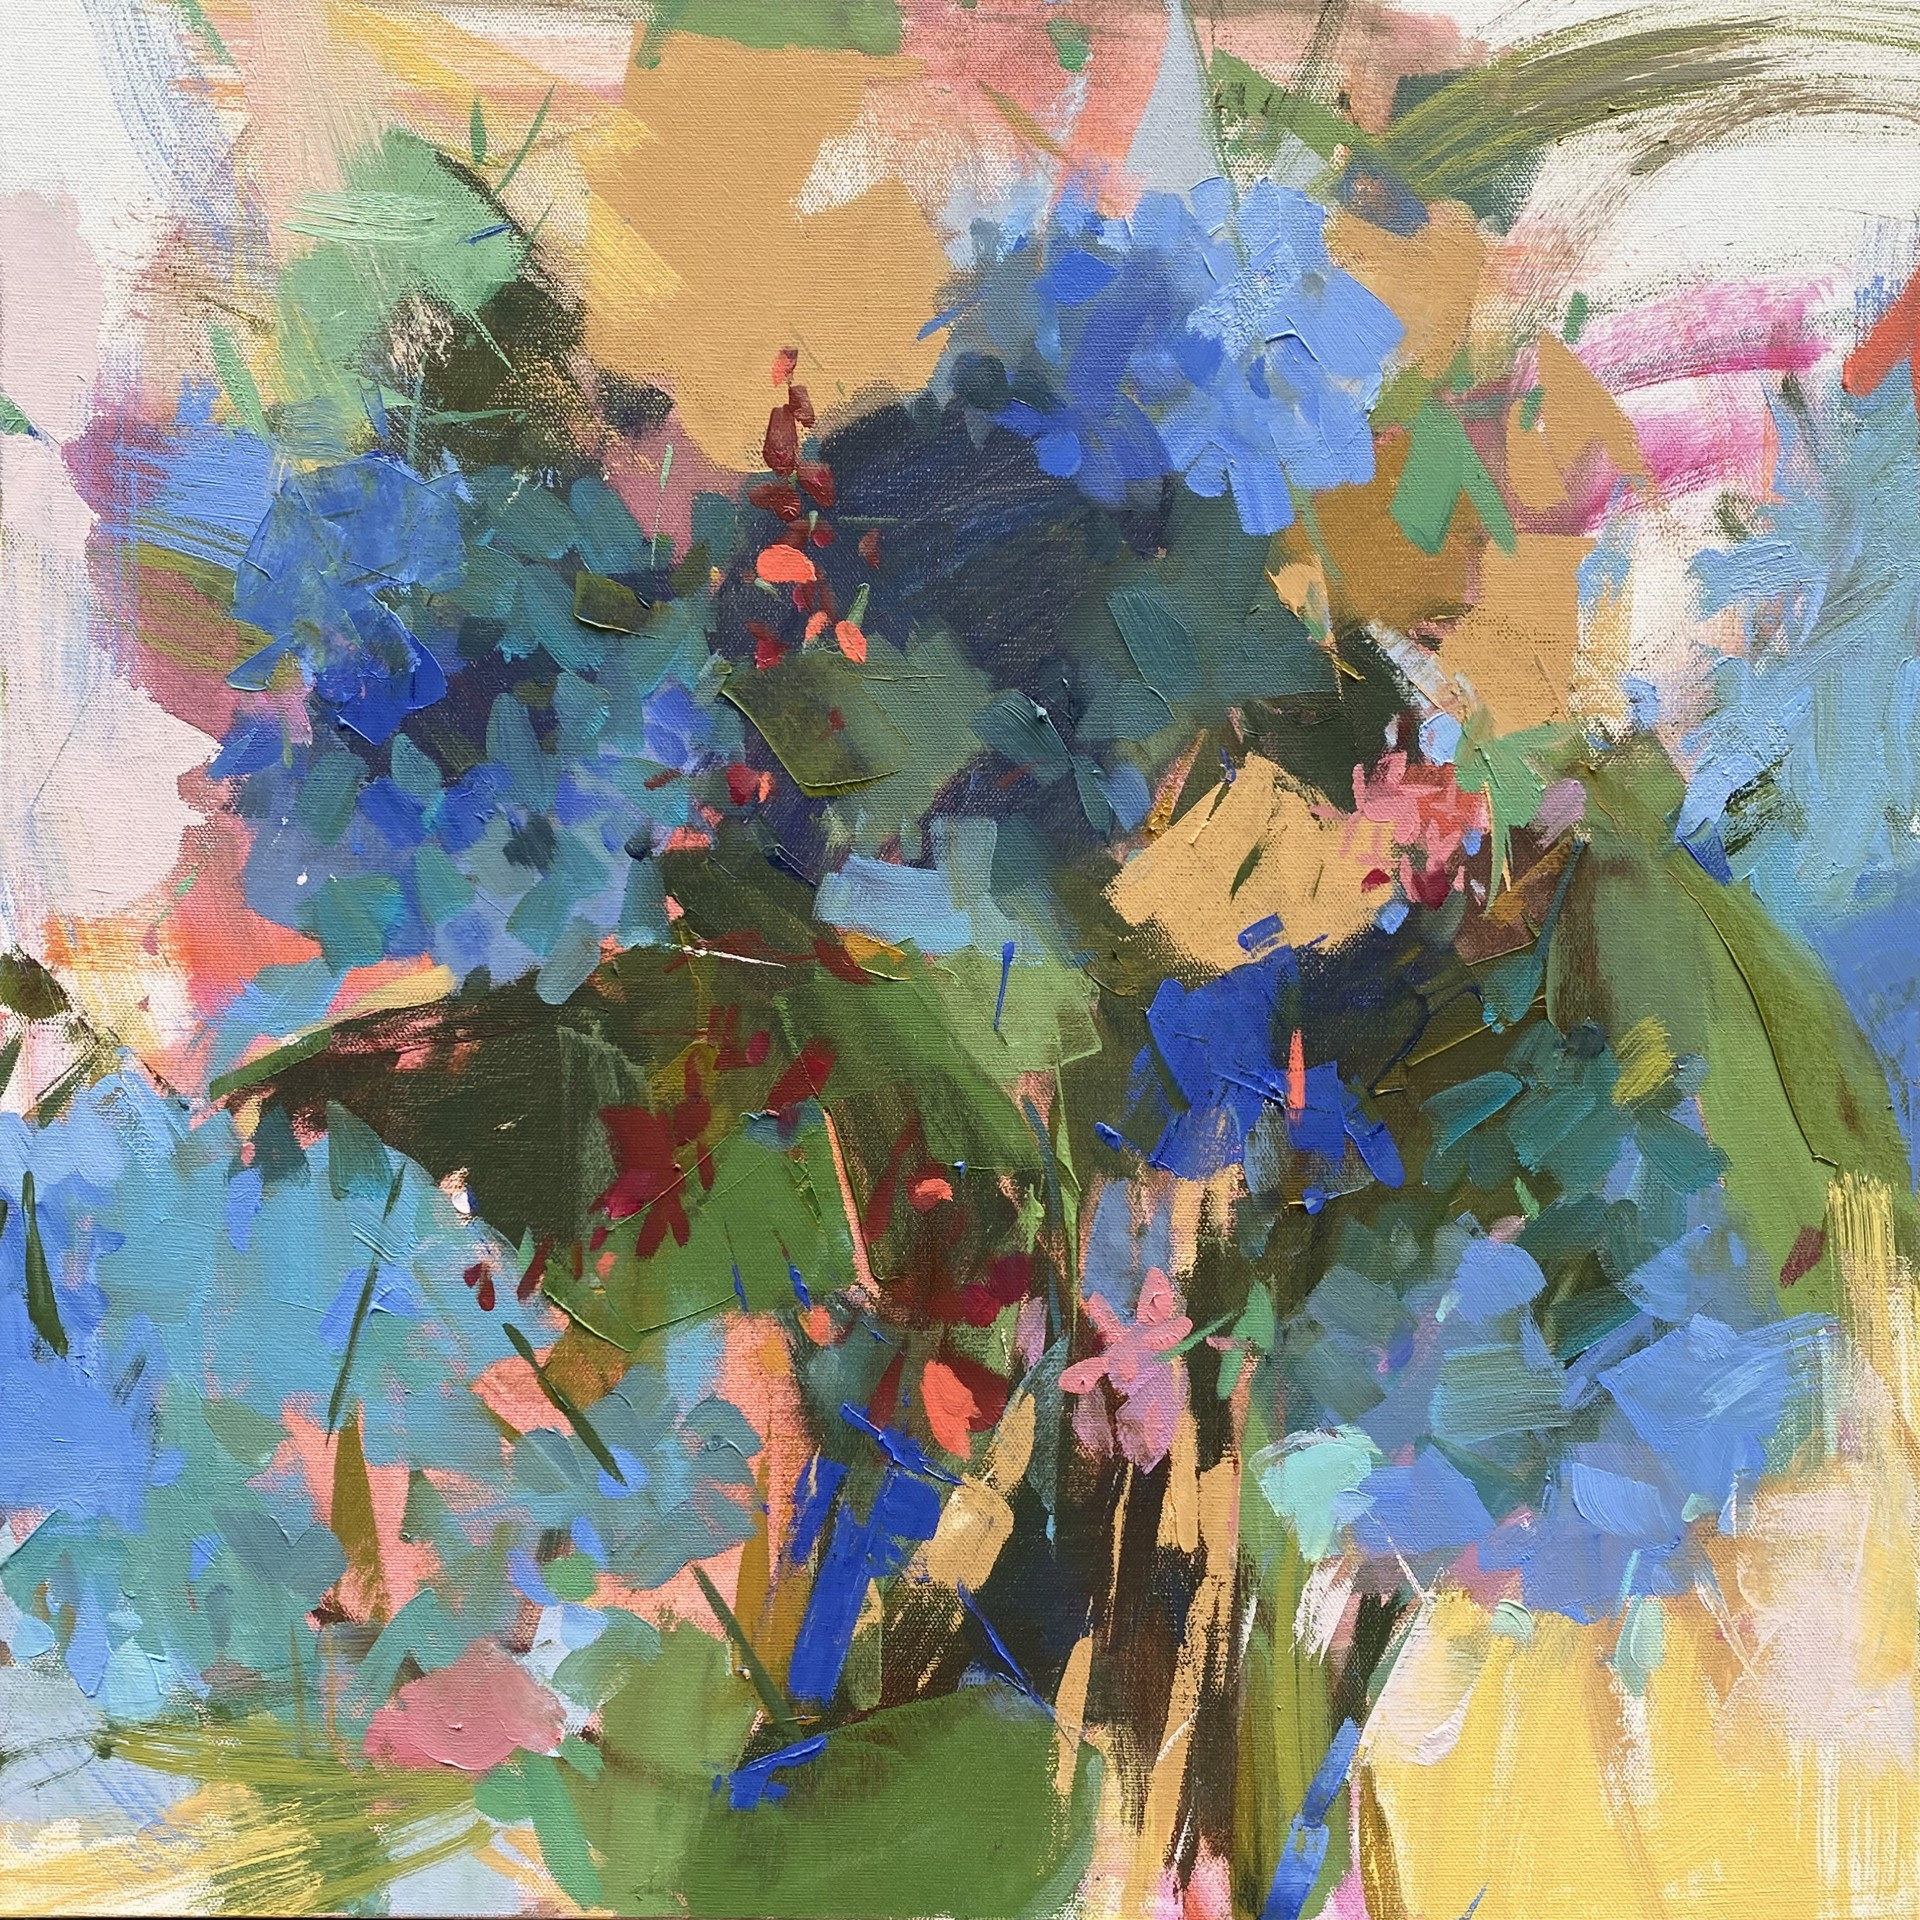 Petal Confetti, IV by Marissa Vogl